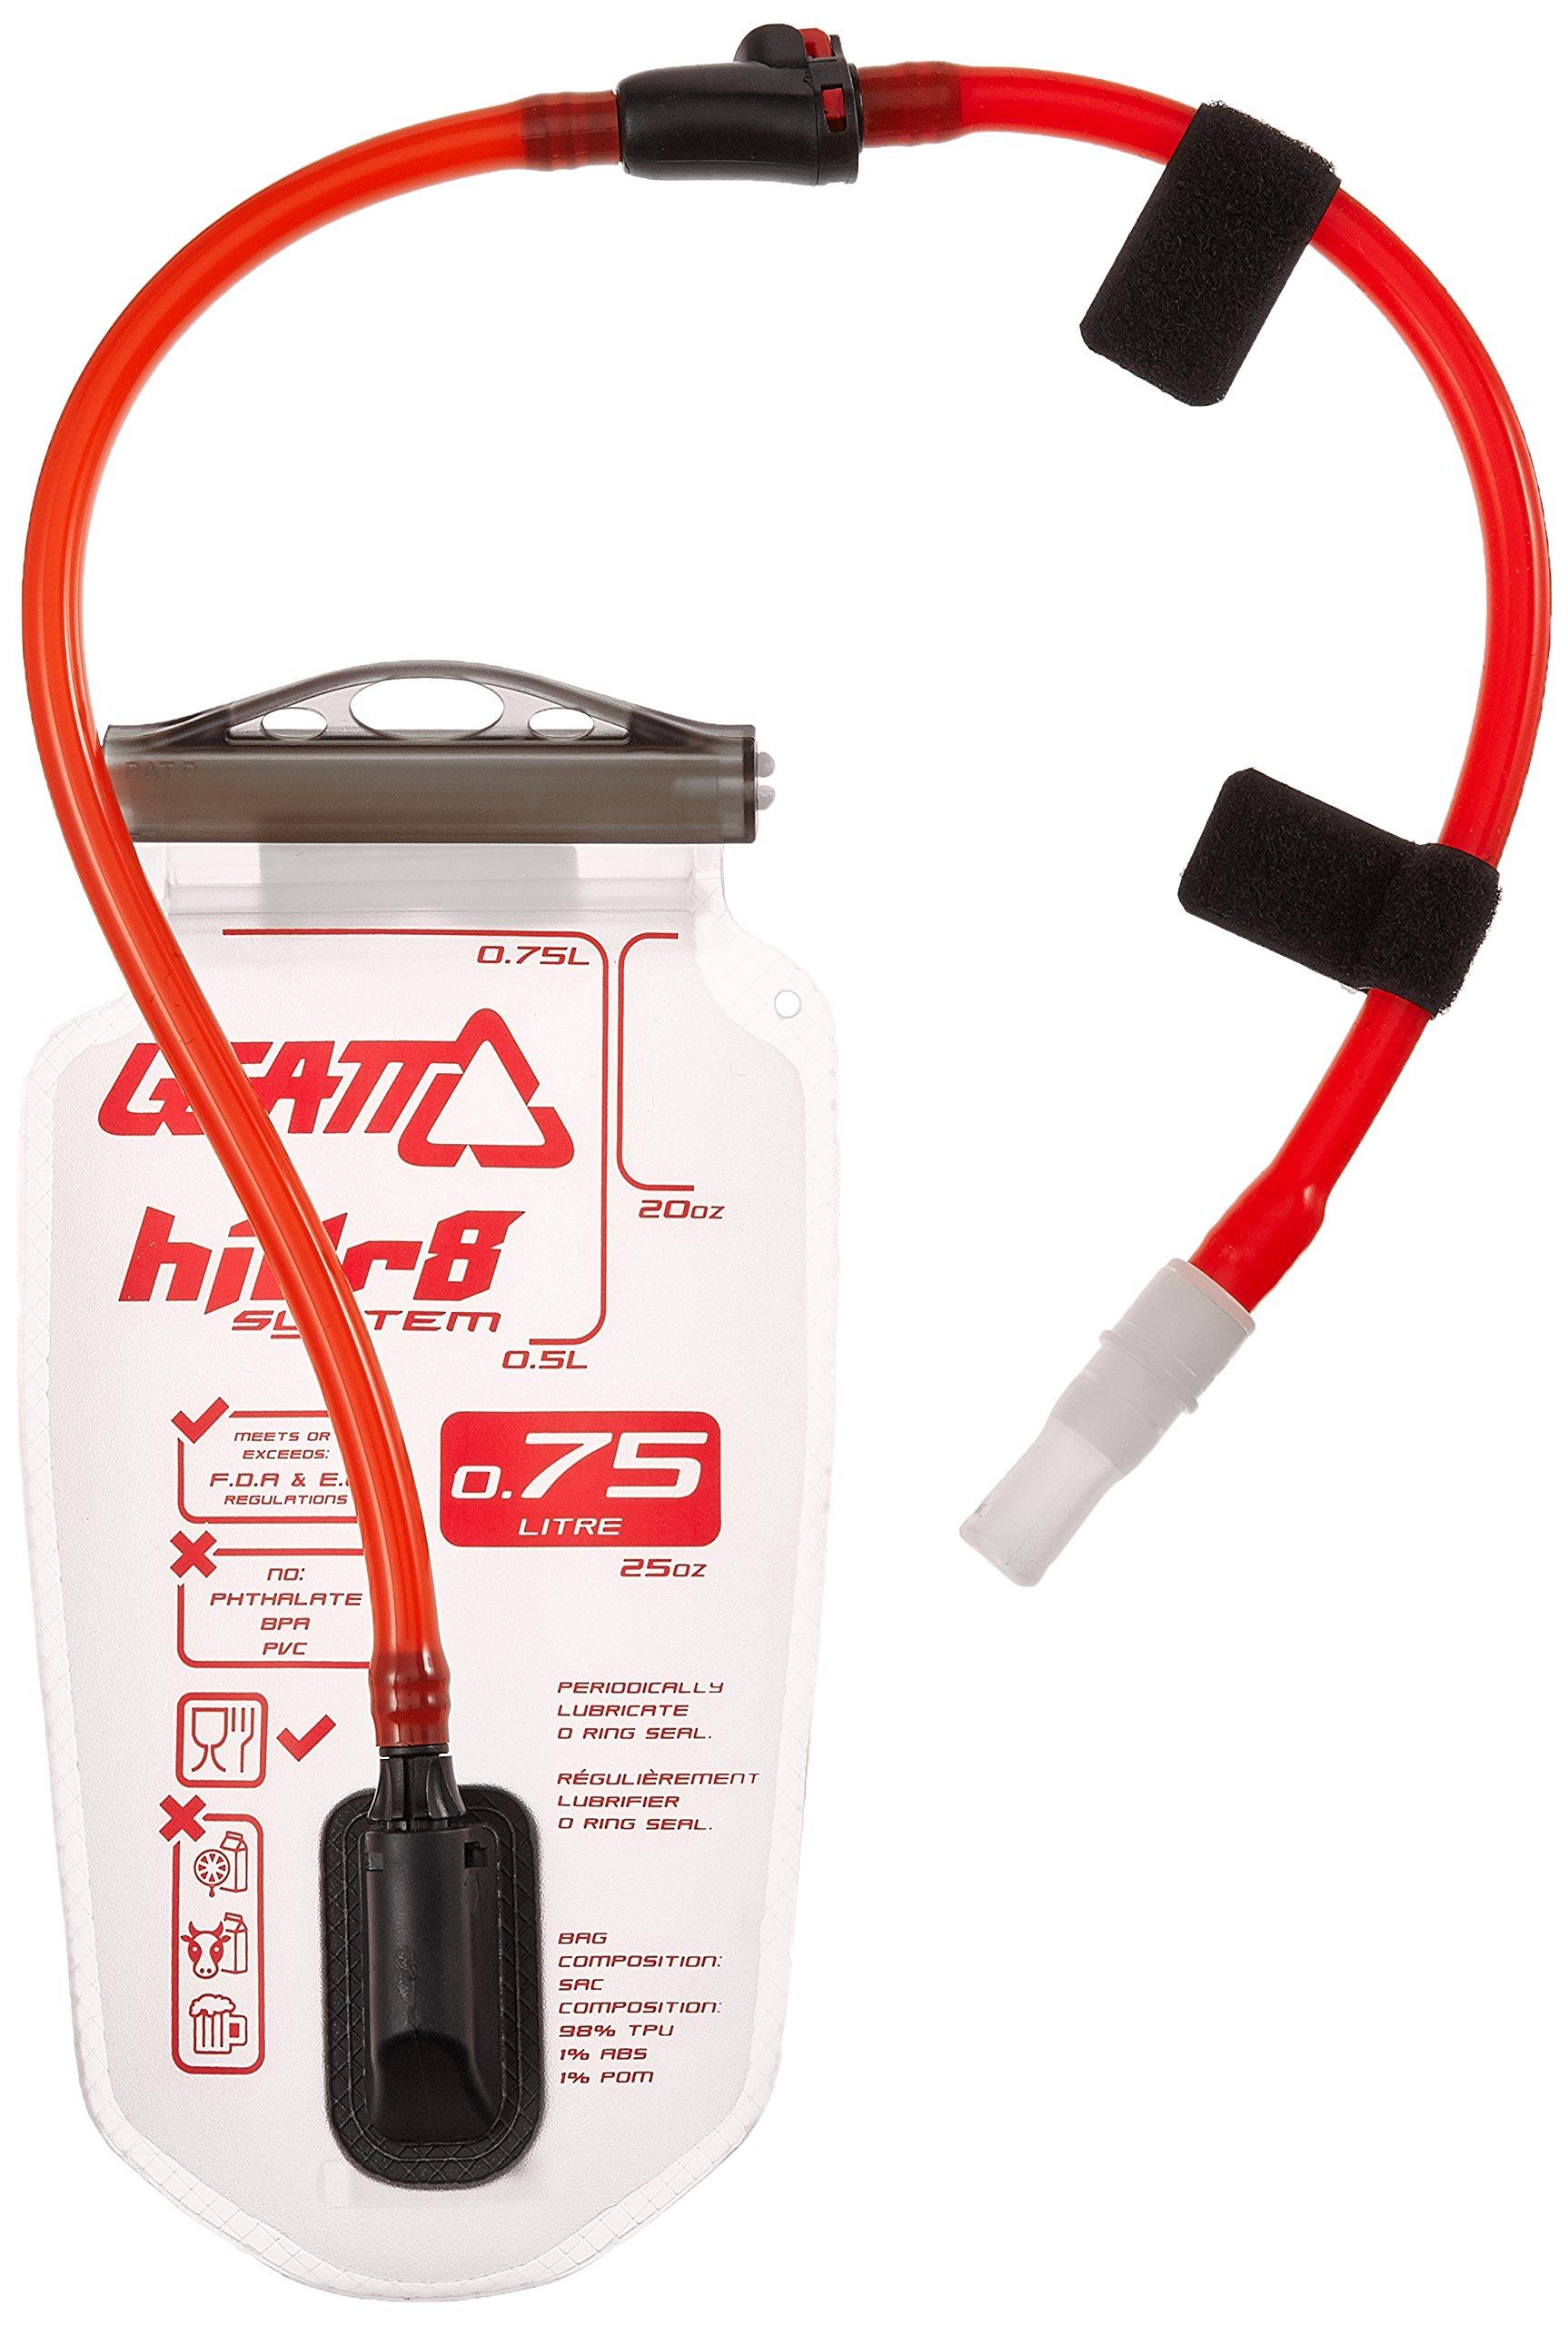 Leatt Hydration Bladder Flat CleanTech Luggage Accessories - 0.75L/25oz